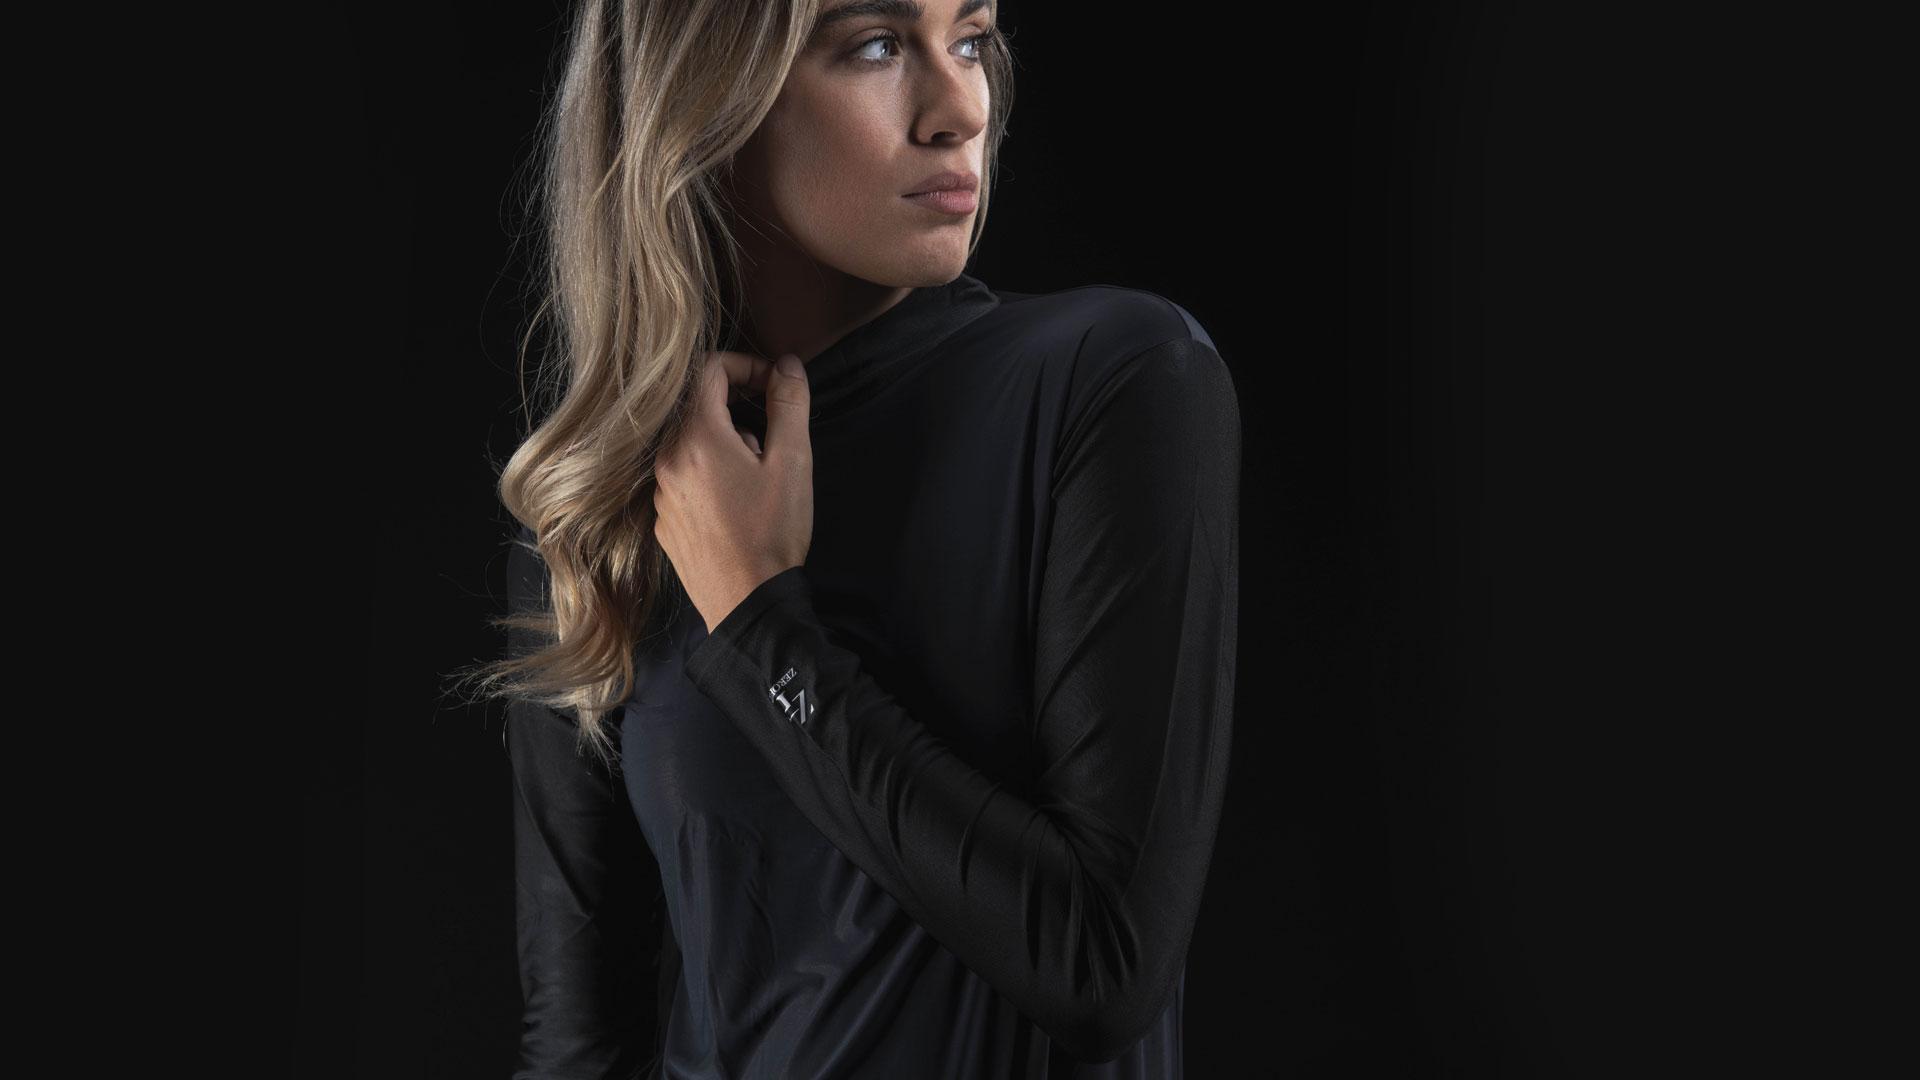 Aimee Black Hybrid 2 retouched C web